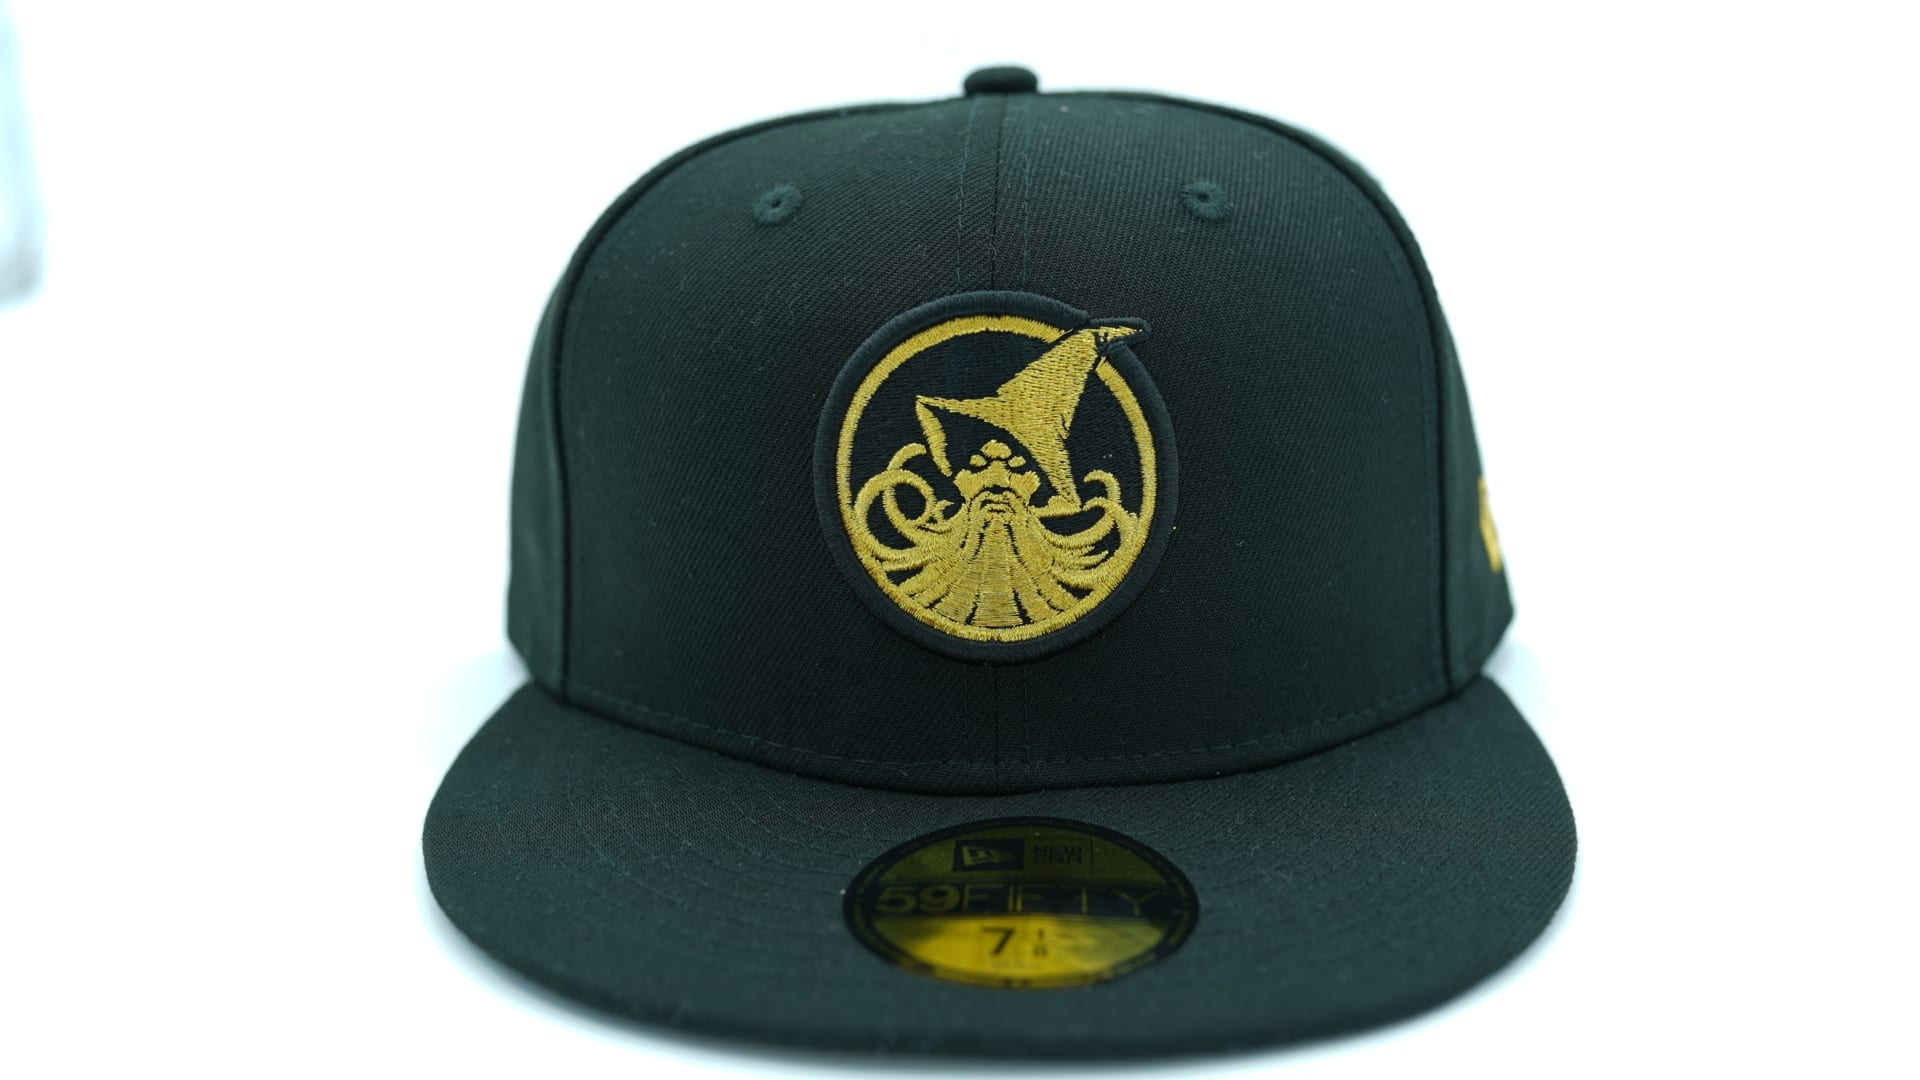 43670ac2f9287 Custom AZ Diamondbacks Snake Head Logo Fitted Cap @ HAT CLUB ...